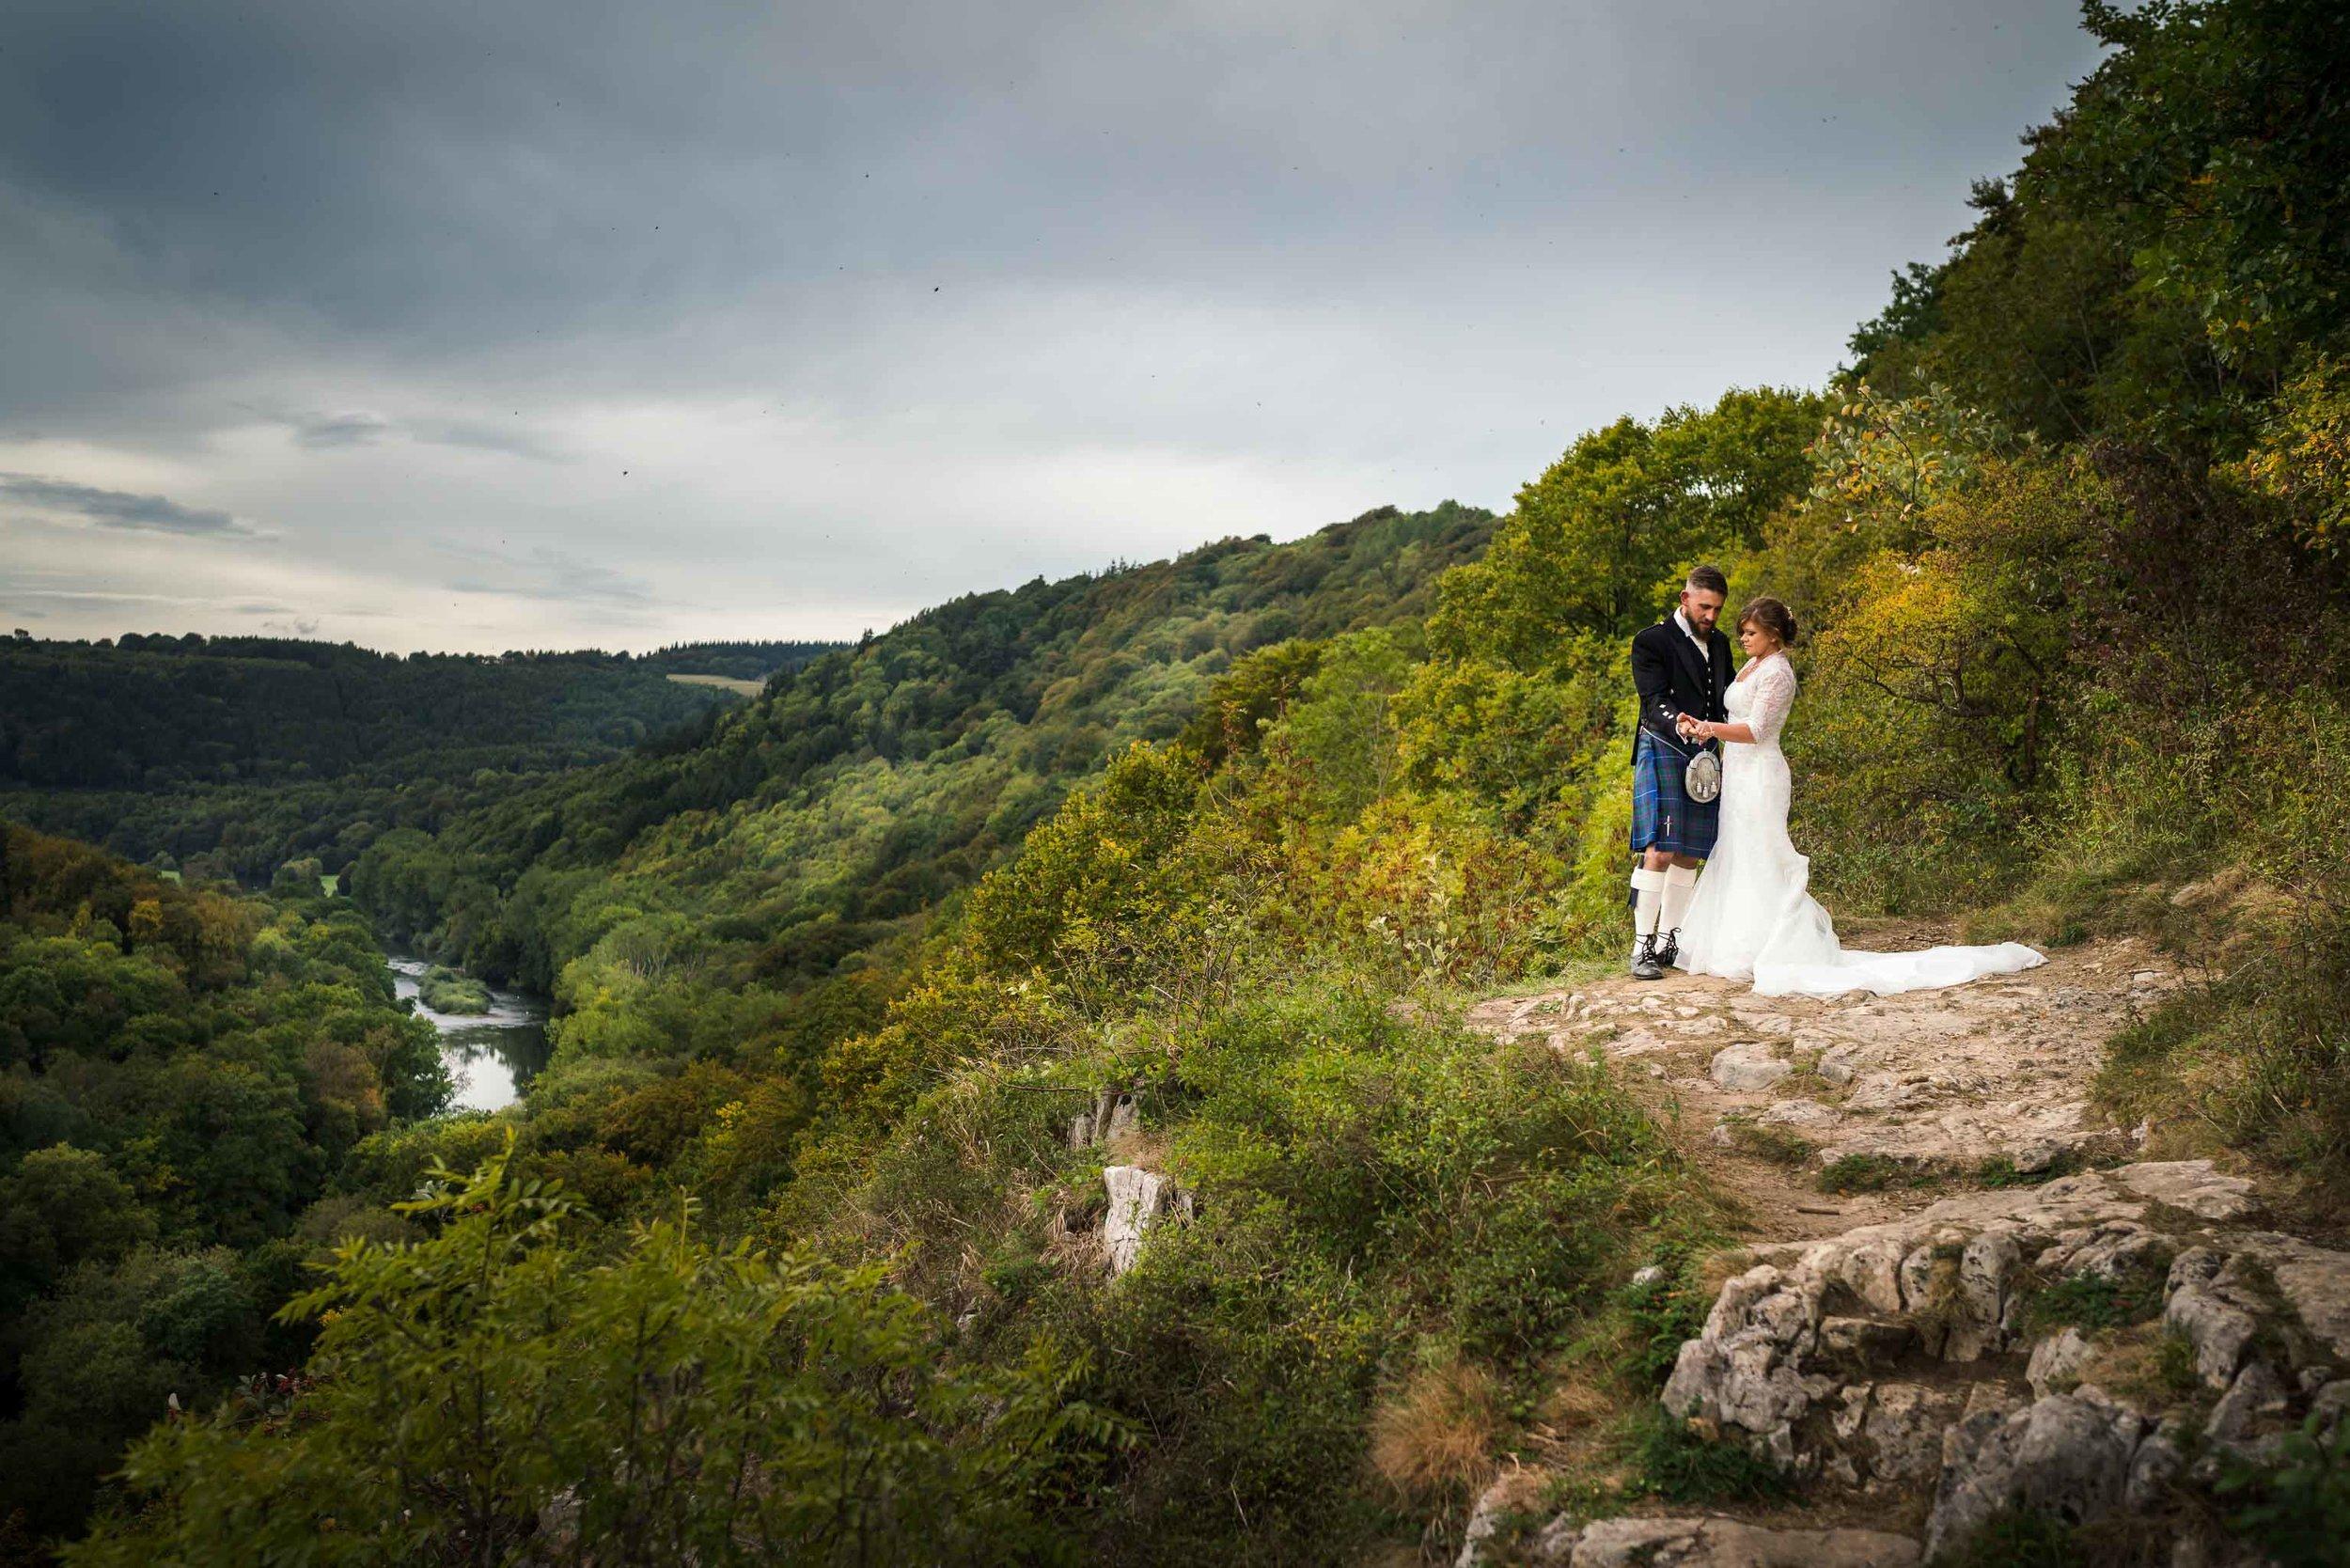 Herefordshire Wedding Photographer, Symonds Yat Wedding, Bride and Groom on Cliff